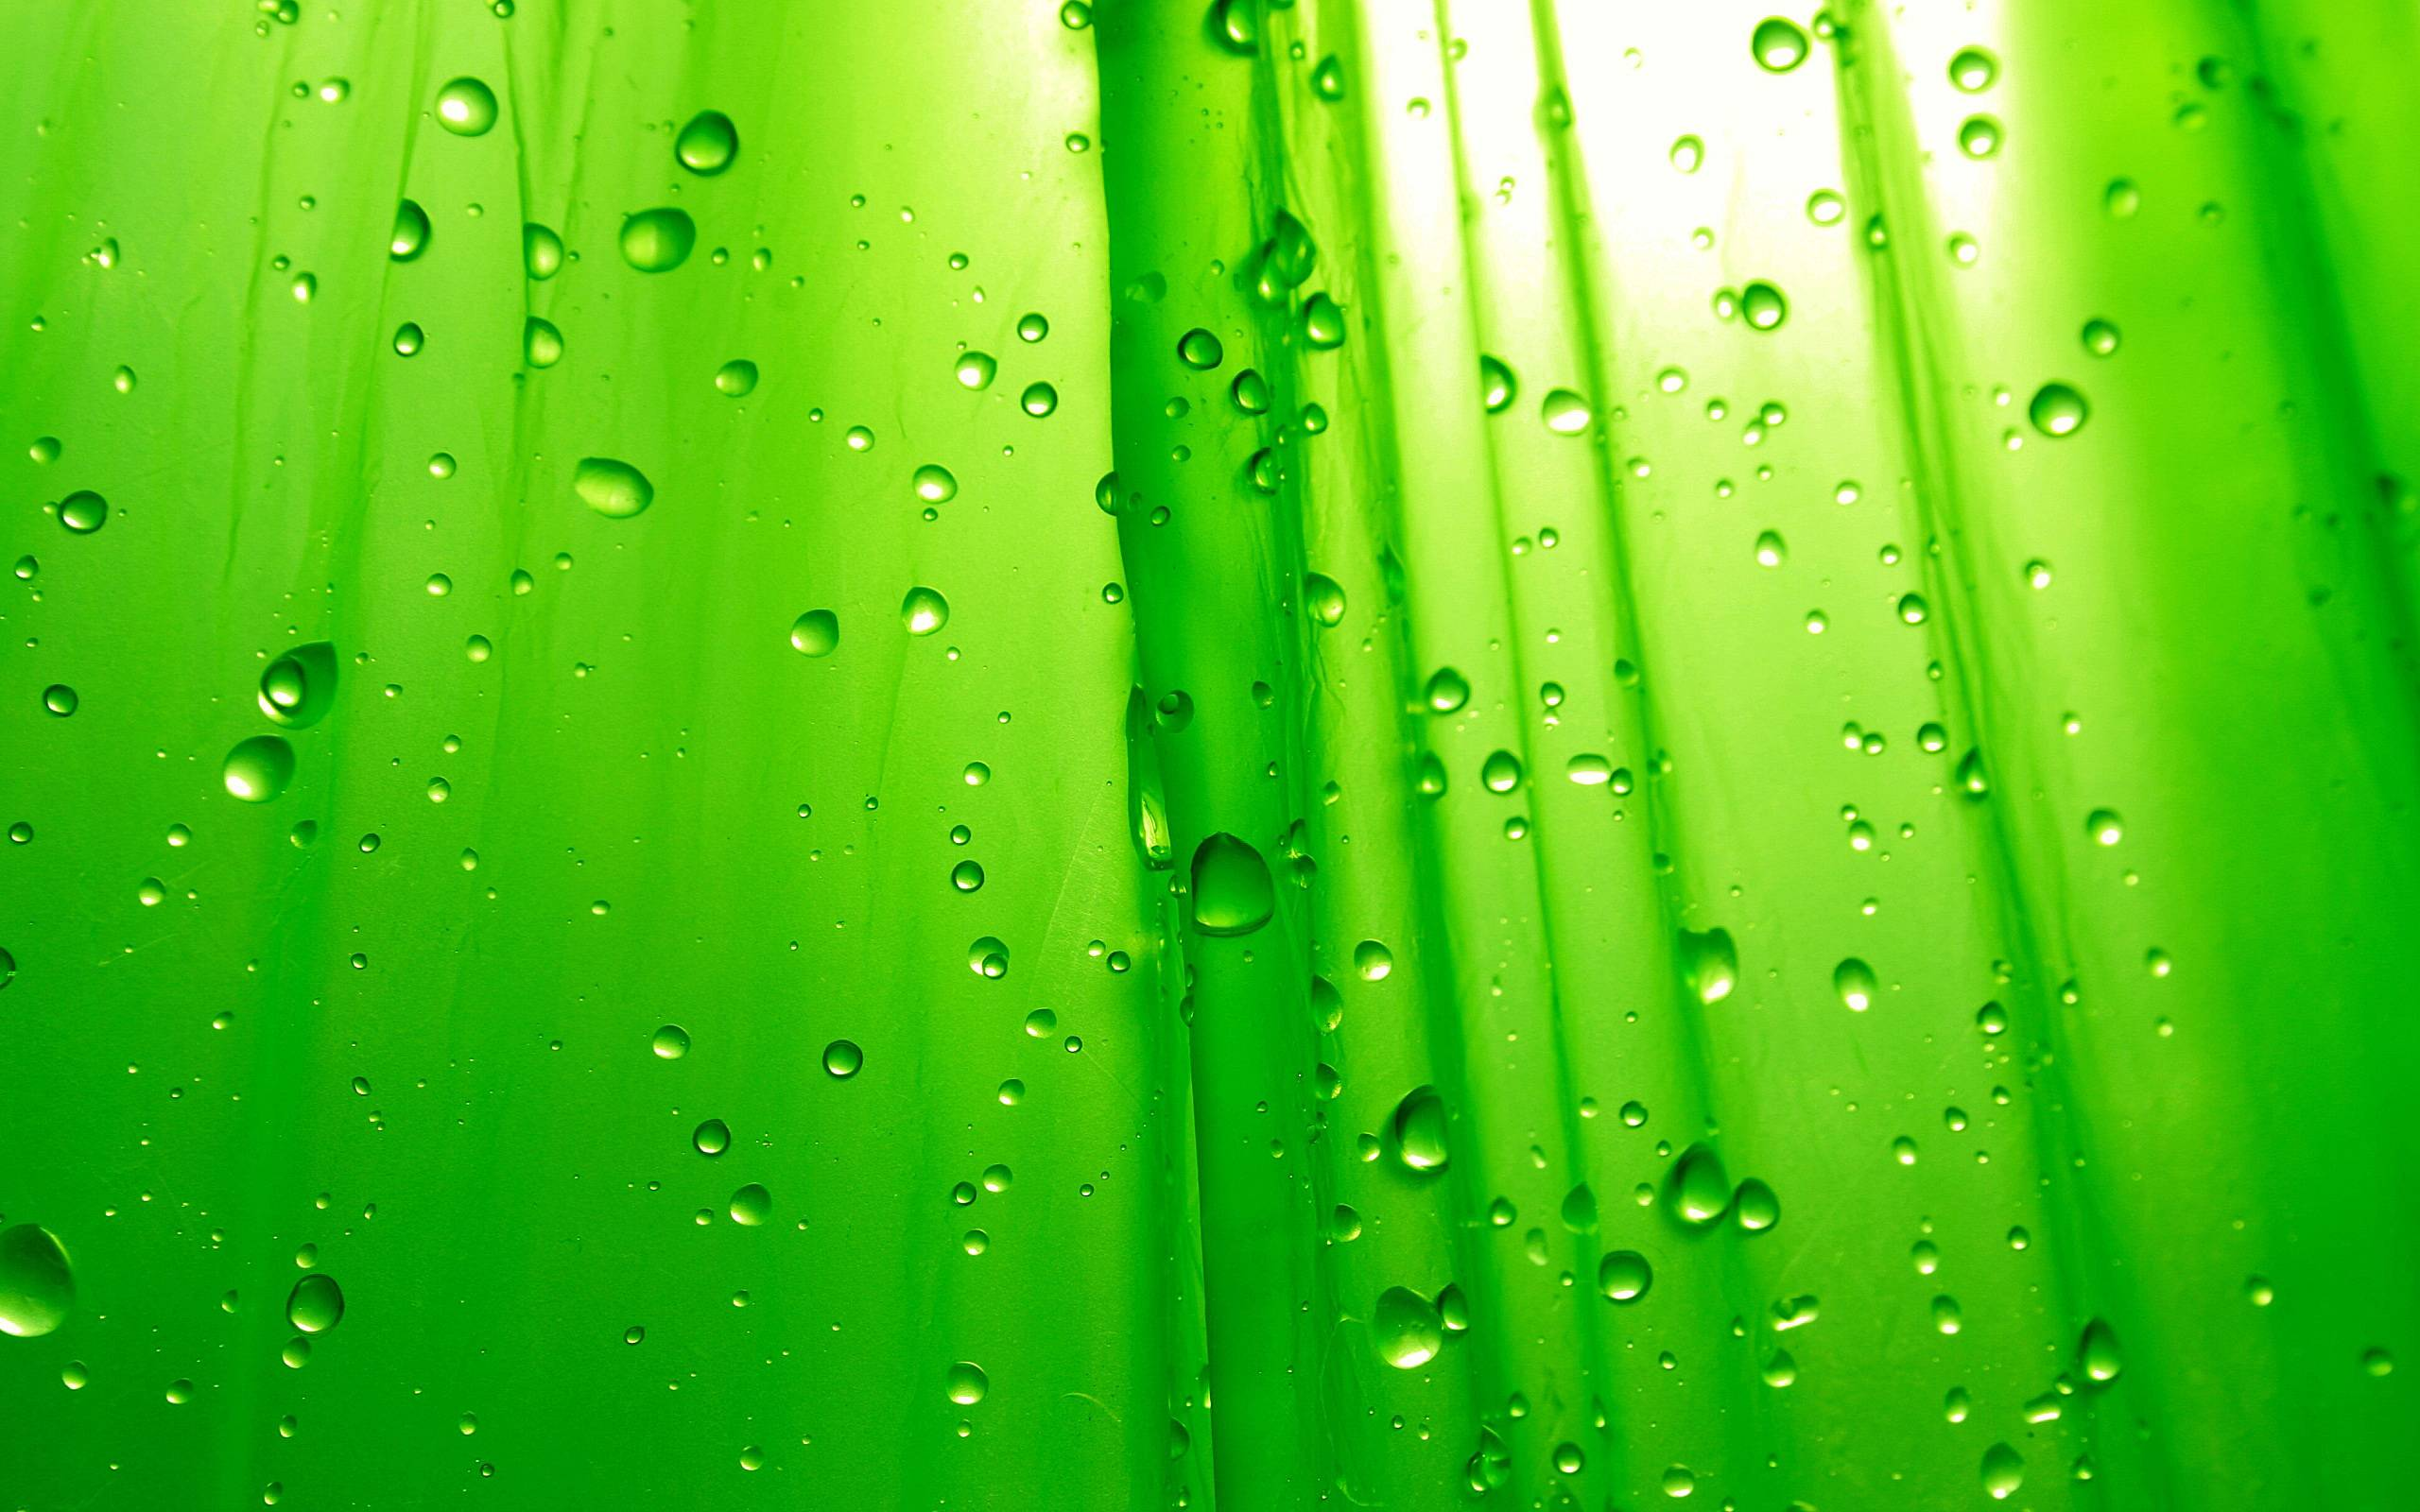 Hd wallpaper green - Go Green Wallpaper Free Wallpaper Green Hd Wallpaper